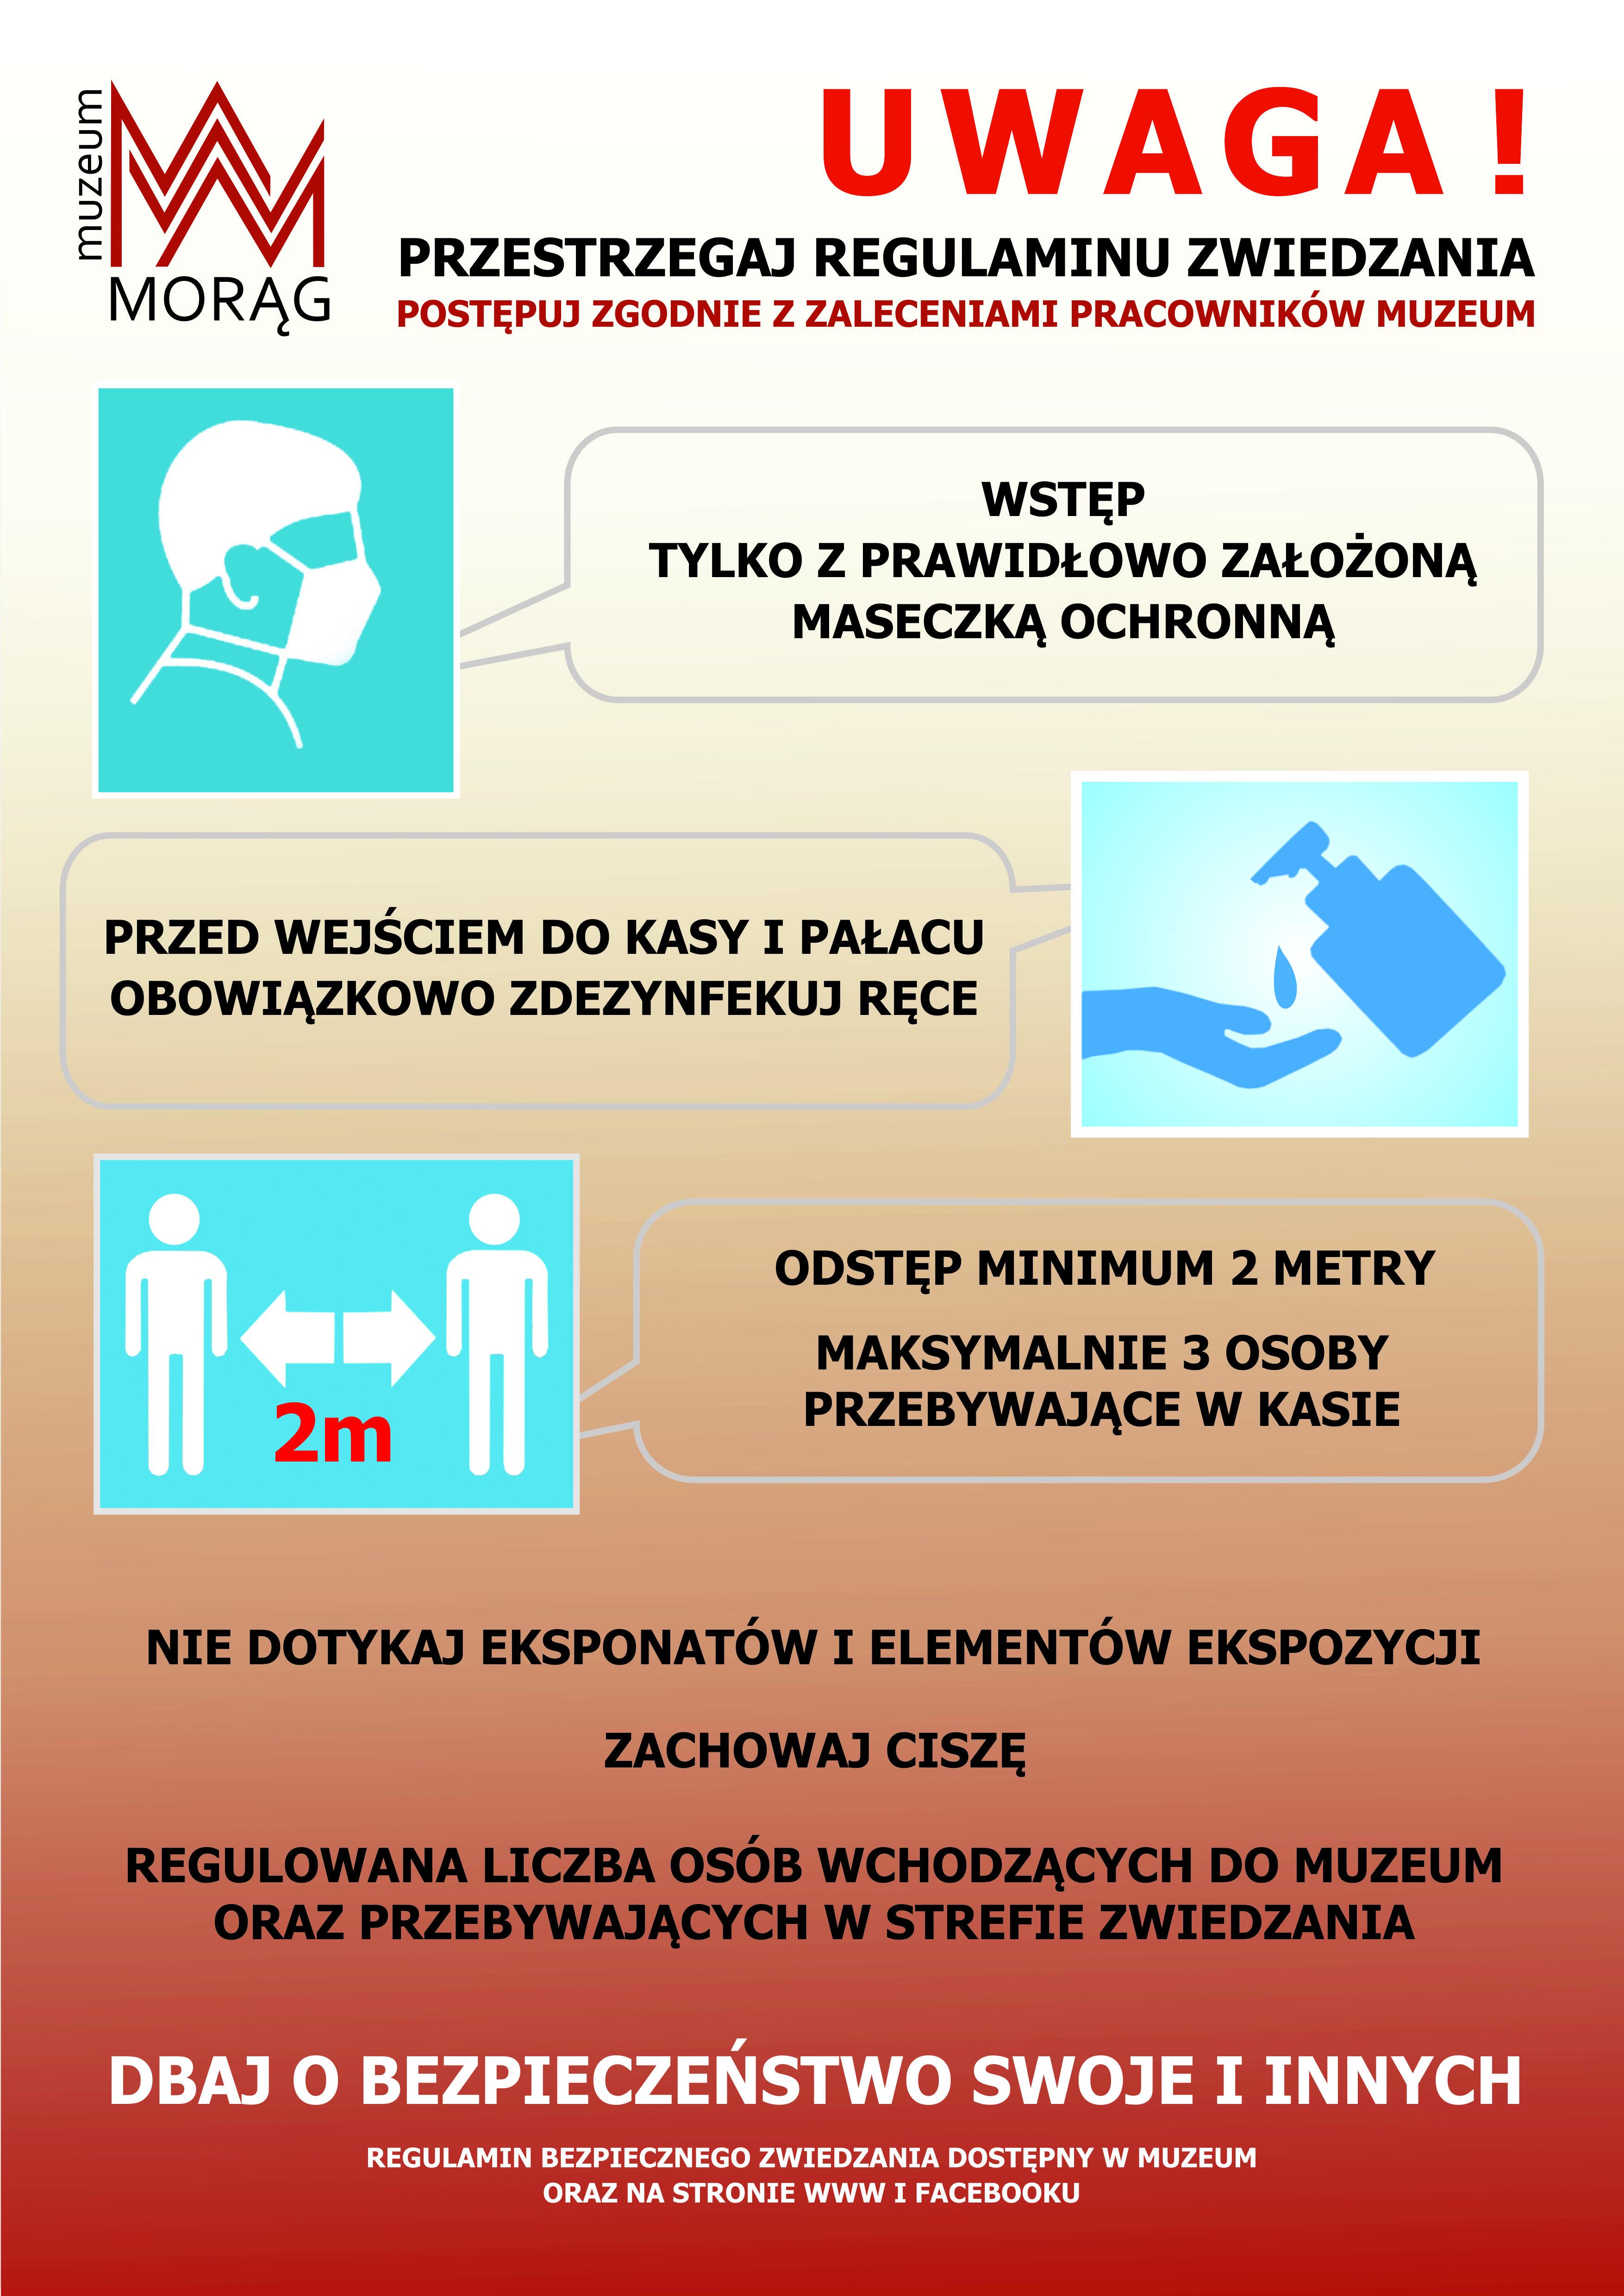 https://m.wmwm.pl/2020/05/orig/zalacznik-nr-7-plakat-morag-6688.jpg